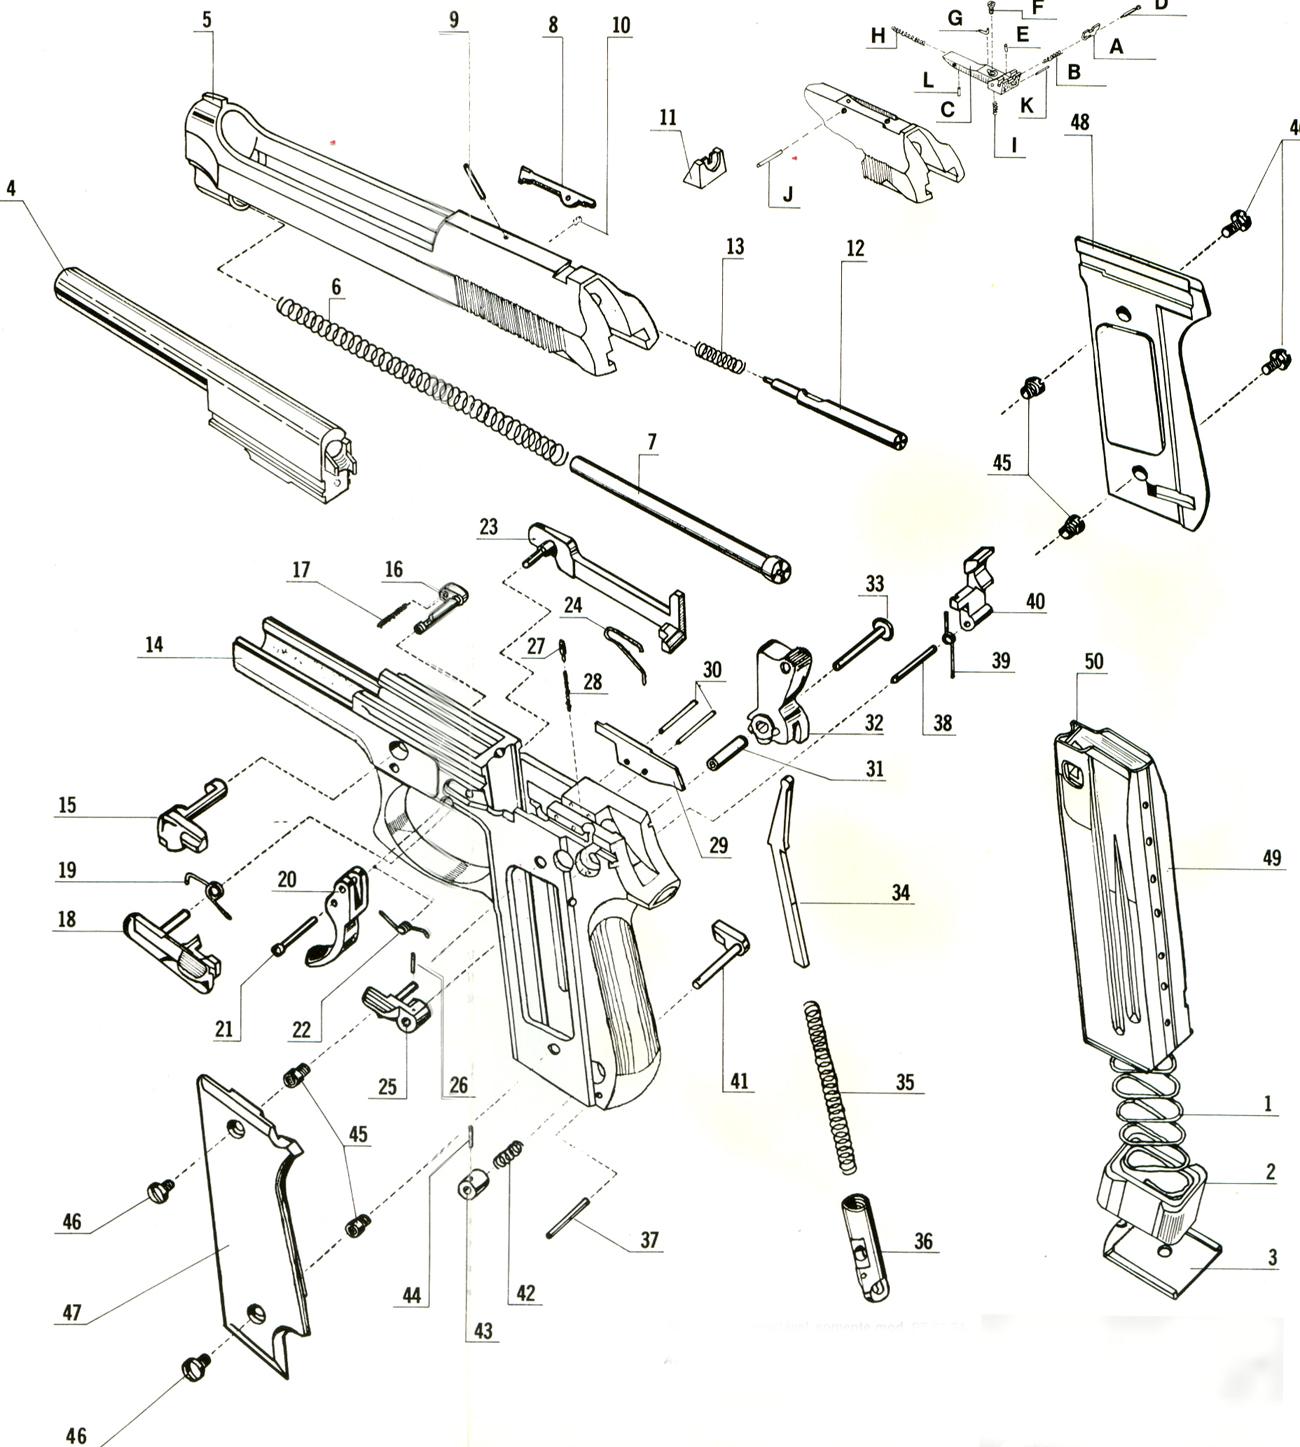 Taurus Pt 1911 Exploded Parts Diagram Wiring Diagrams For Dummies Schematic Pistola 57 E Suas Varia U00e7 U00f5es Armas On Line Manual